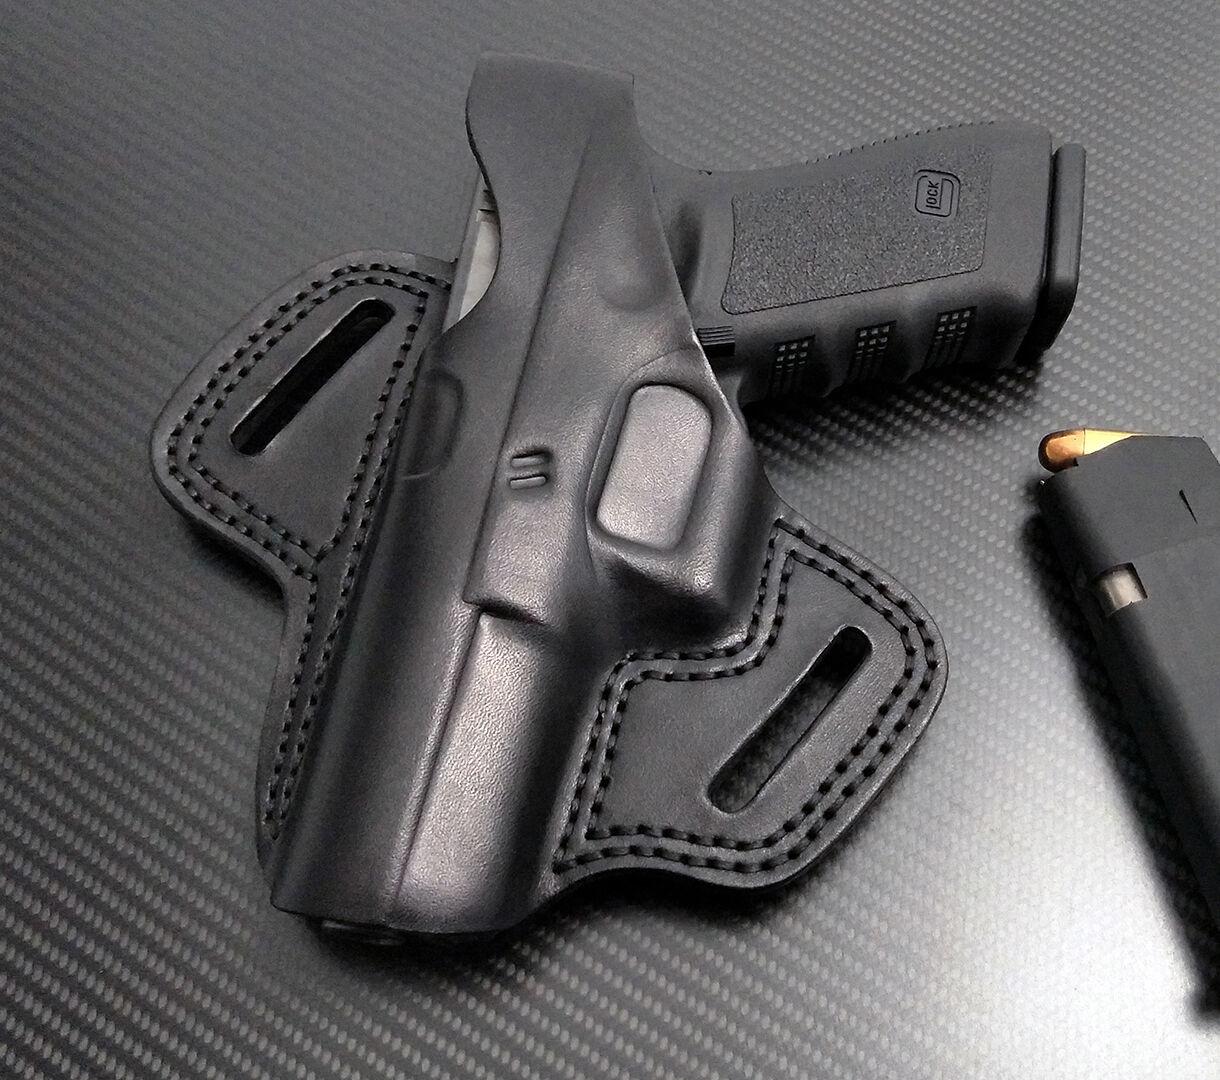 Fits Glock 17,19,22,23,24,31,32,34,35,37,38, LEFT Hand BLACK